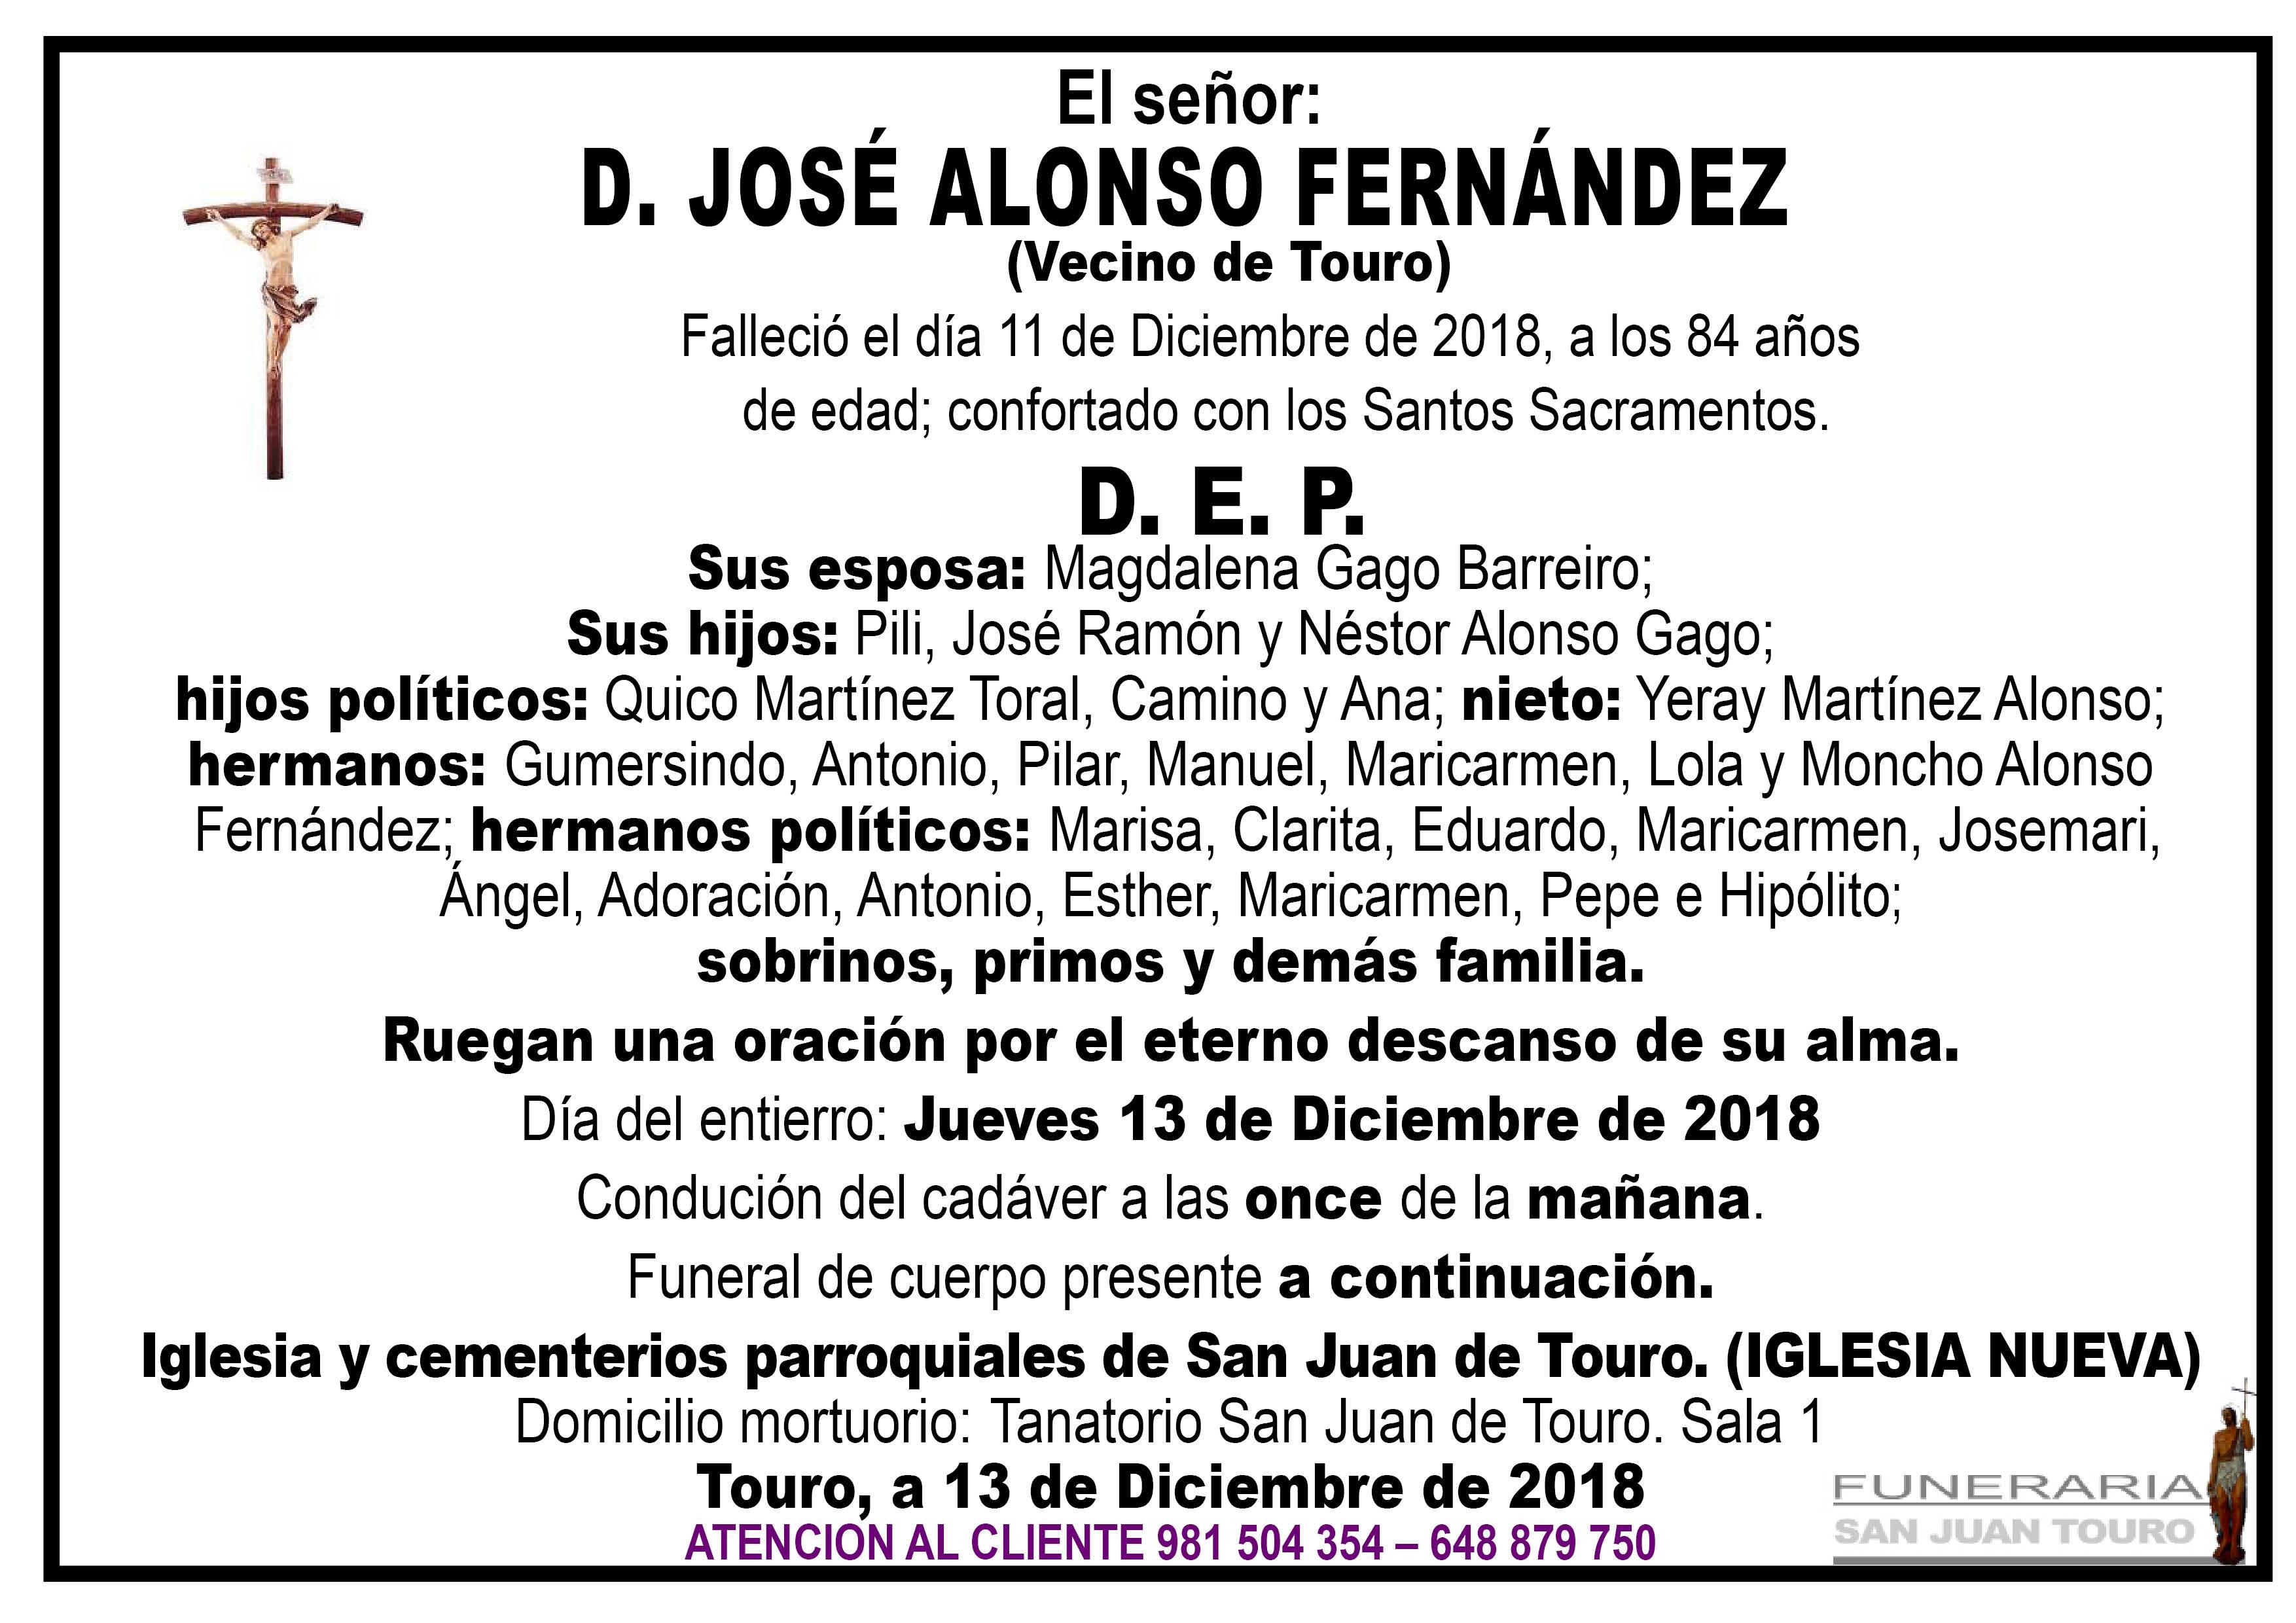 Esquela de SEPELIO DE D. JOSÉ ALONSO FERNÁNDEZ